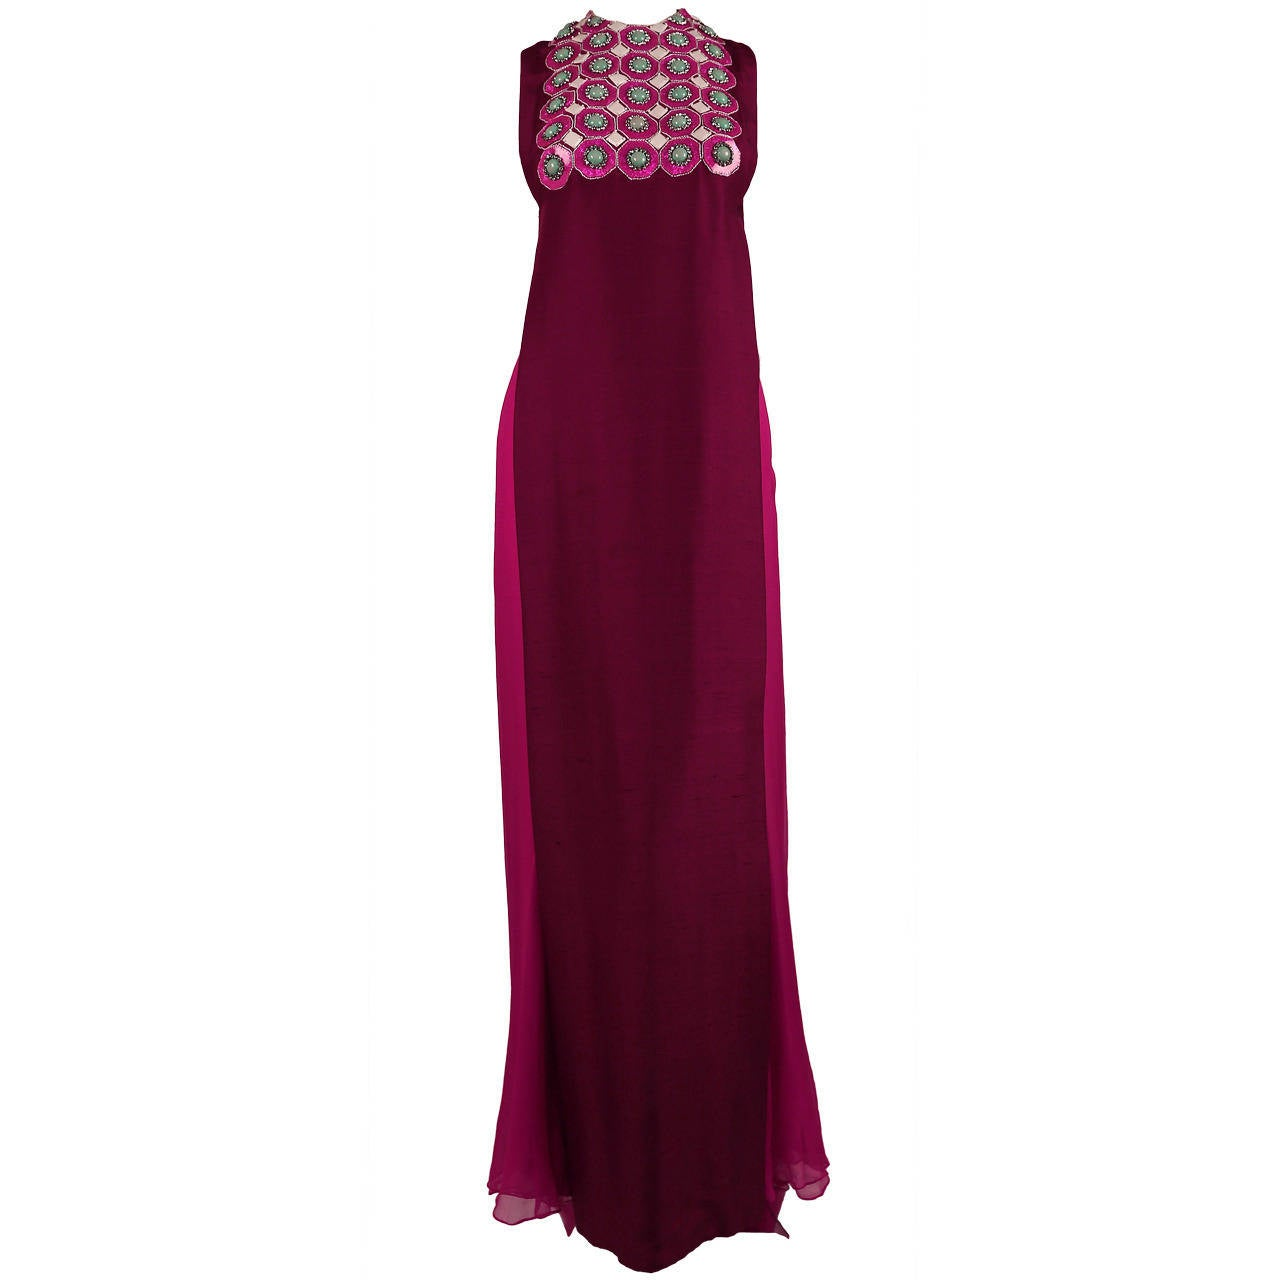 1960's MADAME GRES fuchsia beaded slub silk tabard & silk chiffon skirt ensemble 1